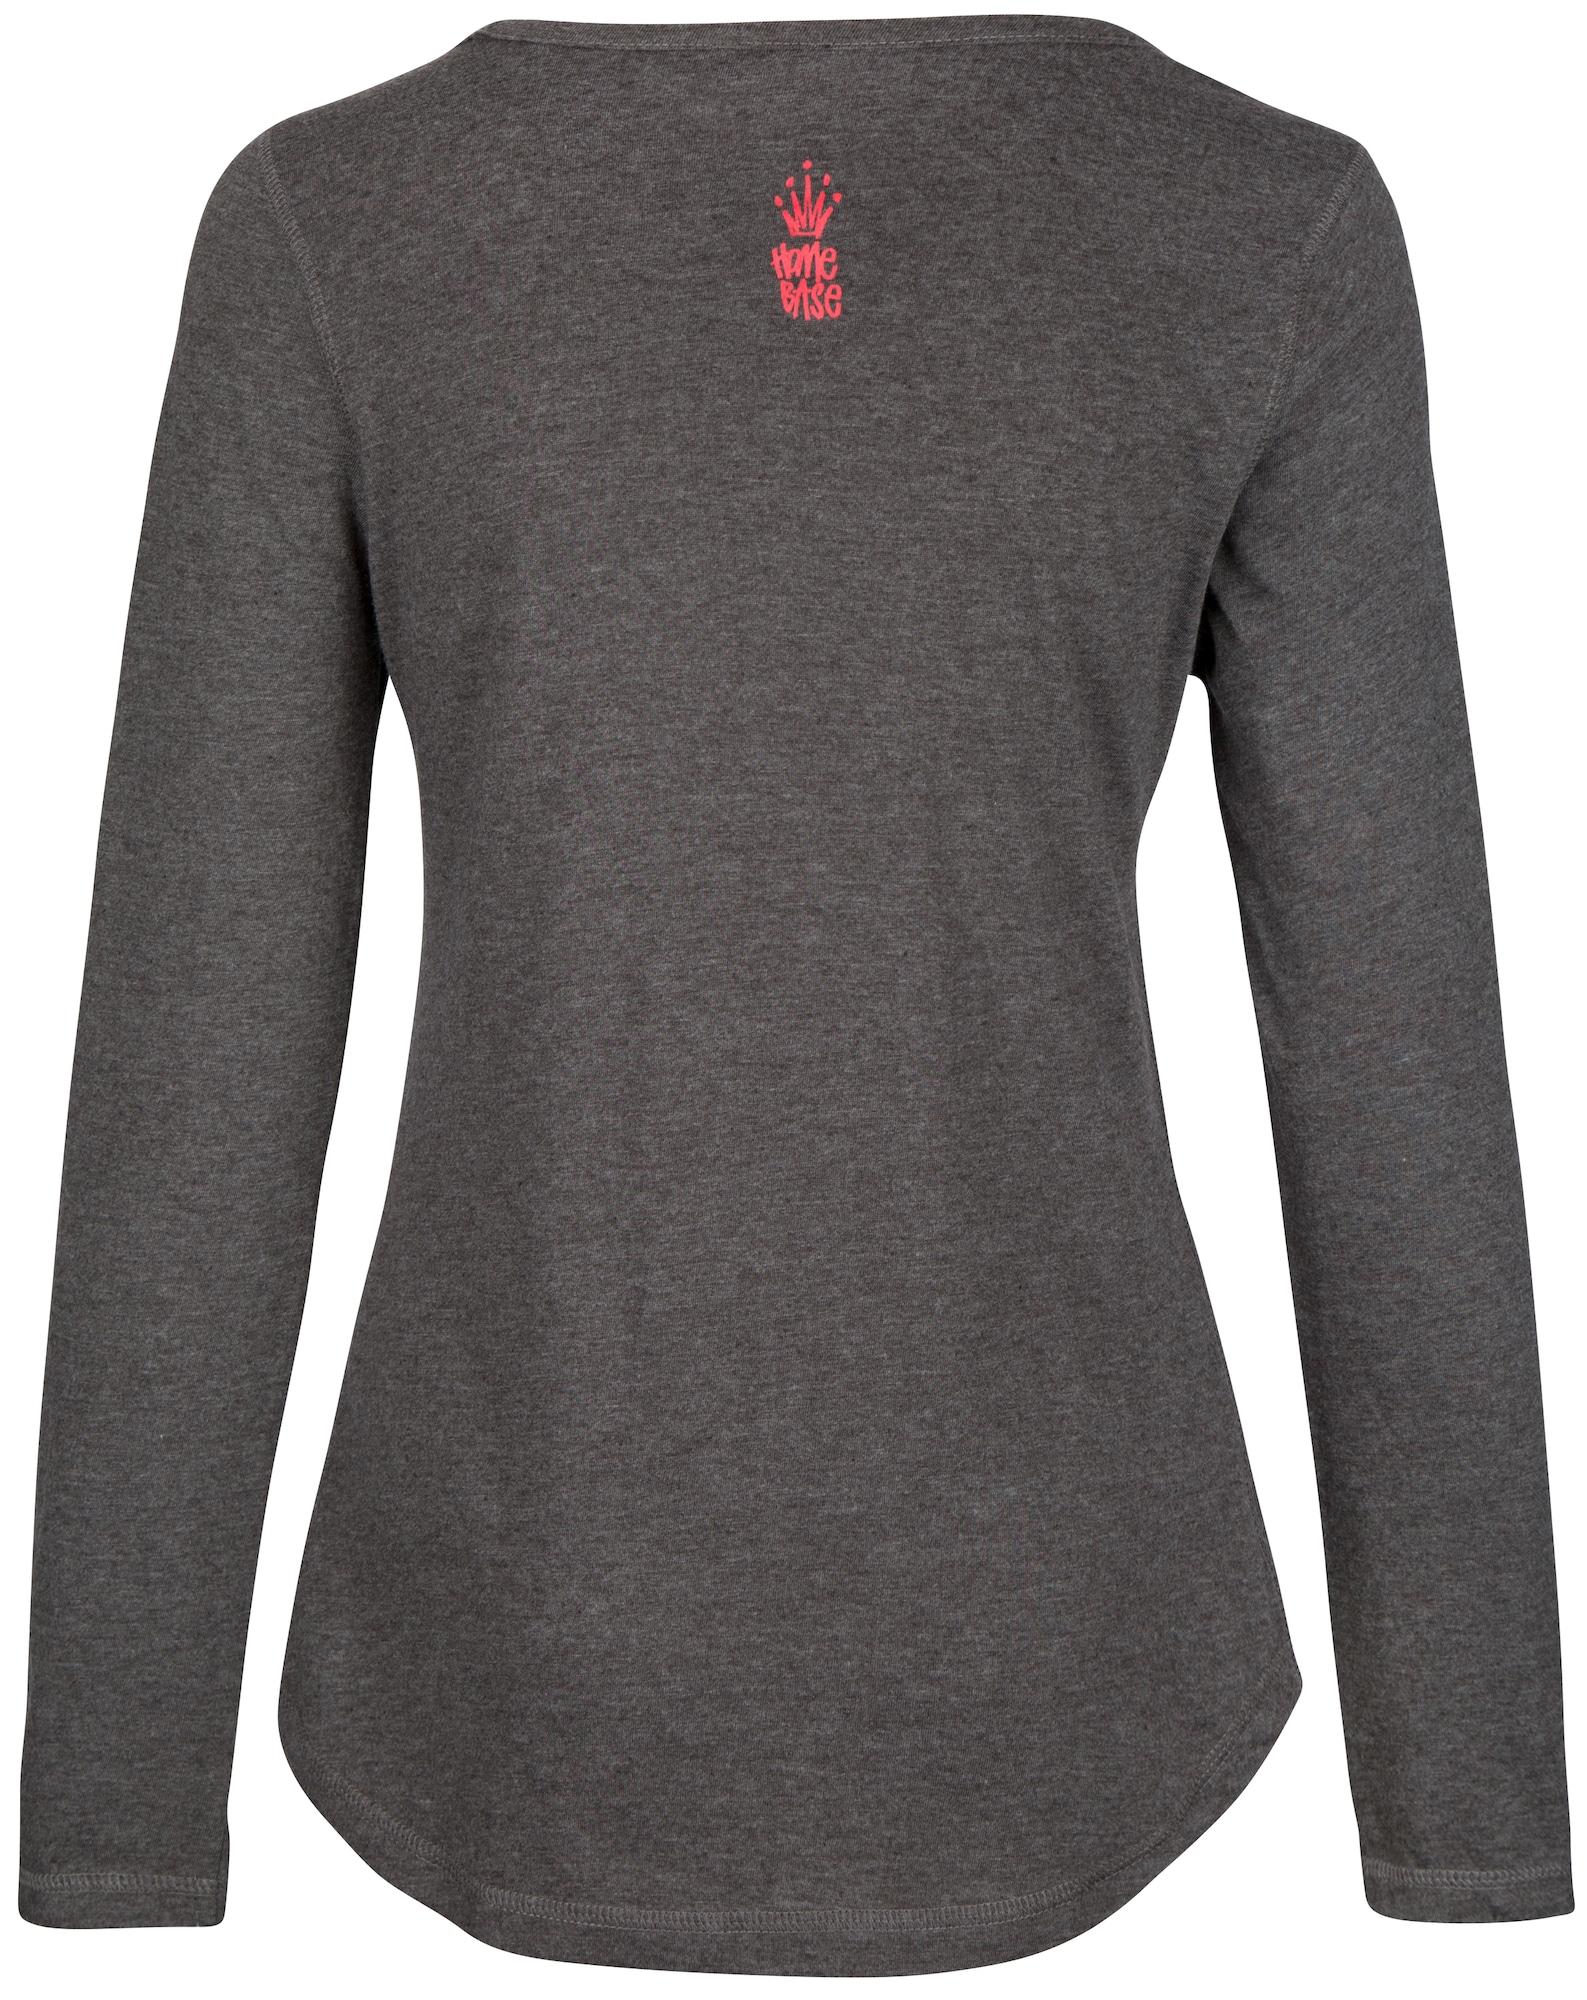 HOMEBASE, Damen Shirt Brandalised by Homebase, grijs / donkergrijs / grijs gemêleerd